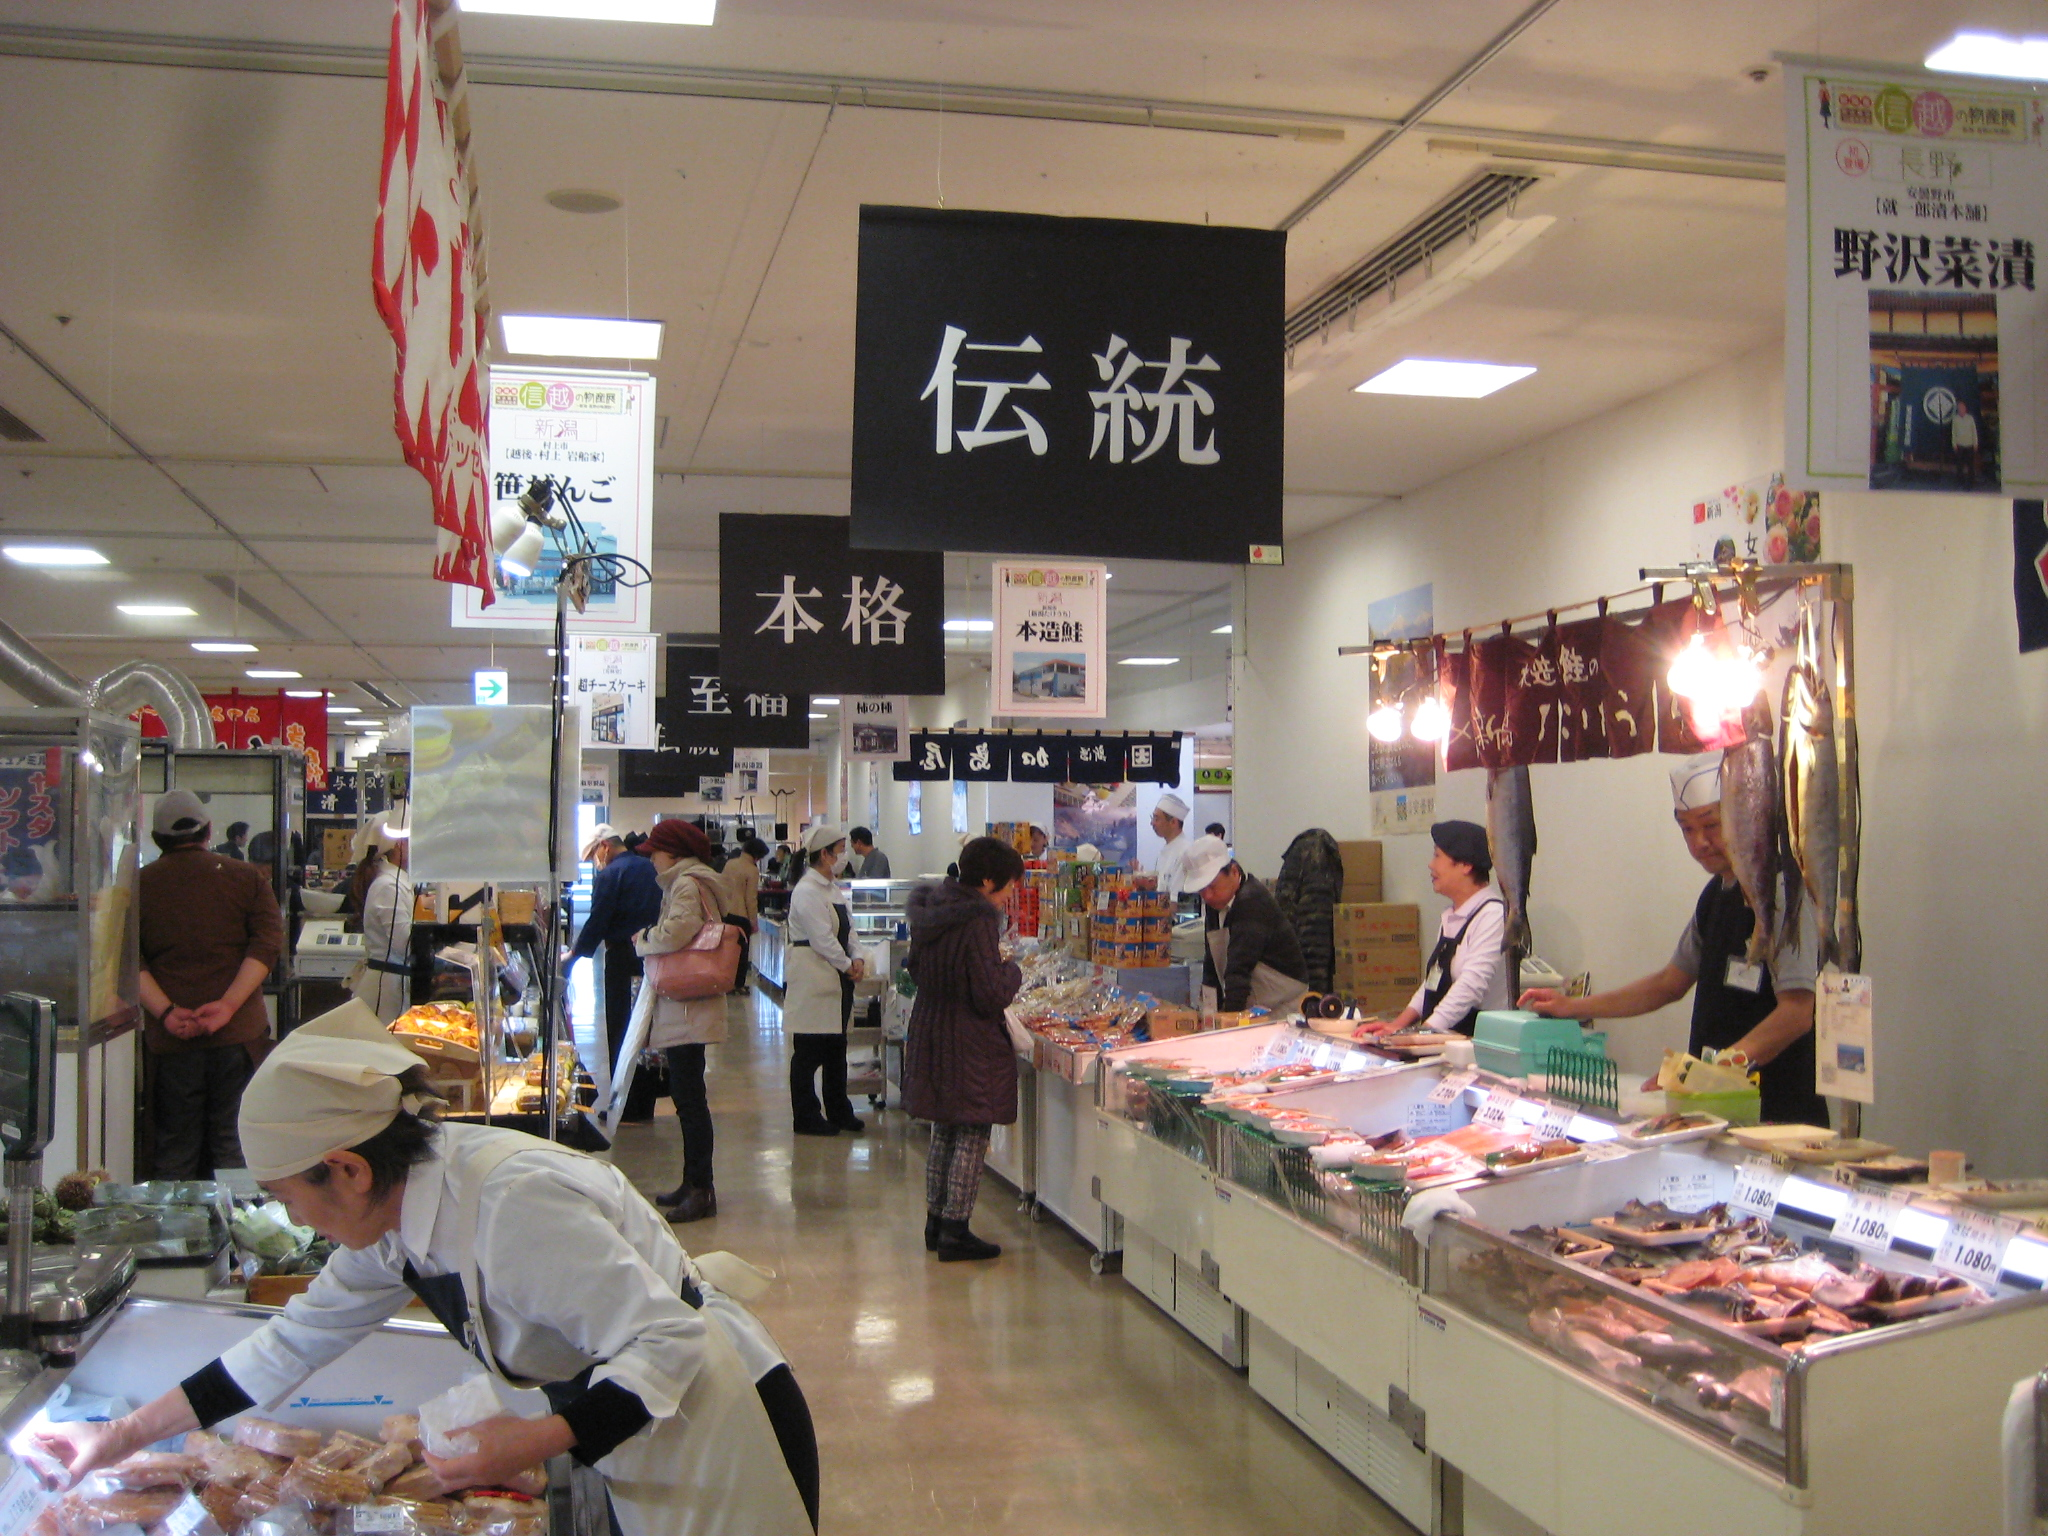 H28新潟・長野 信越の物産展:水戸京成百貨店